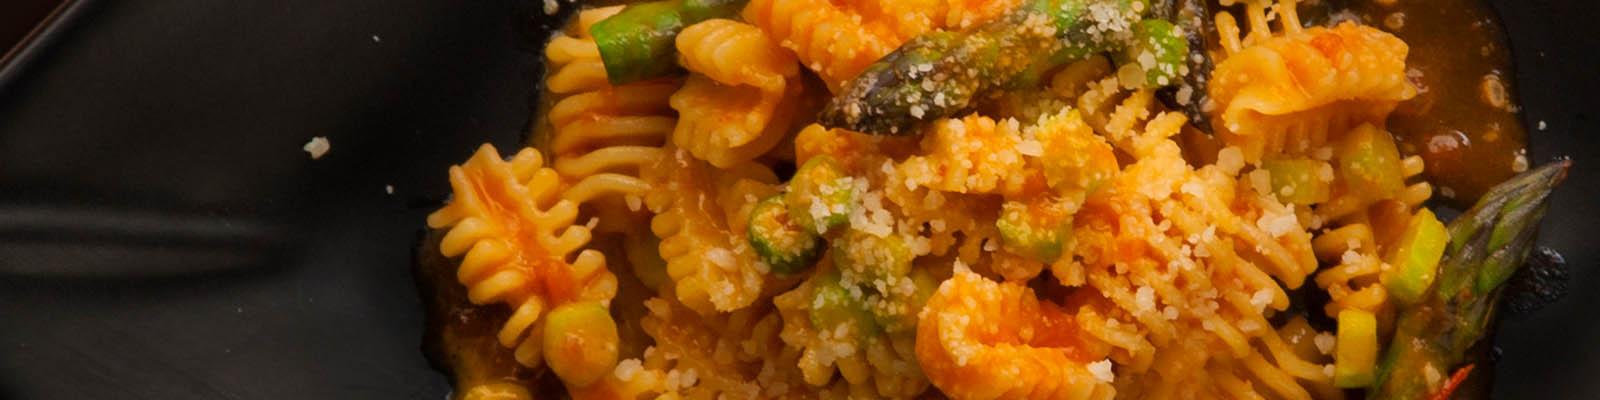 Pasta Garofalo - Radiatori com espargos verdes